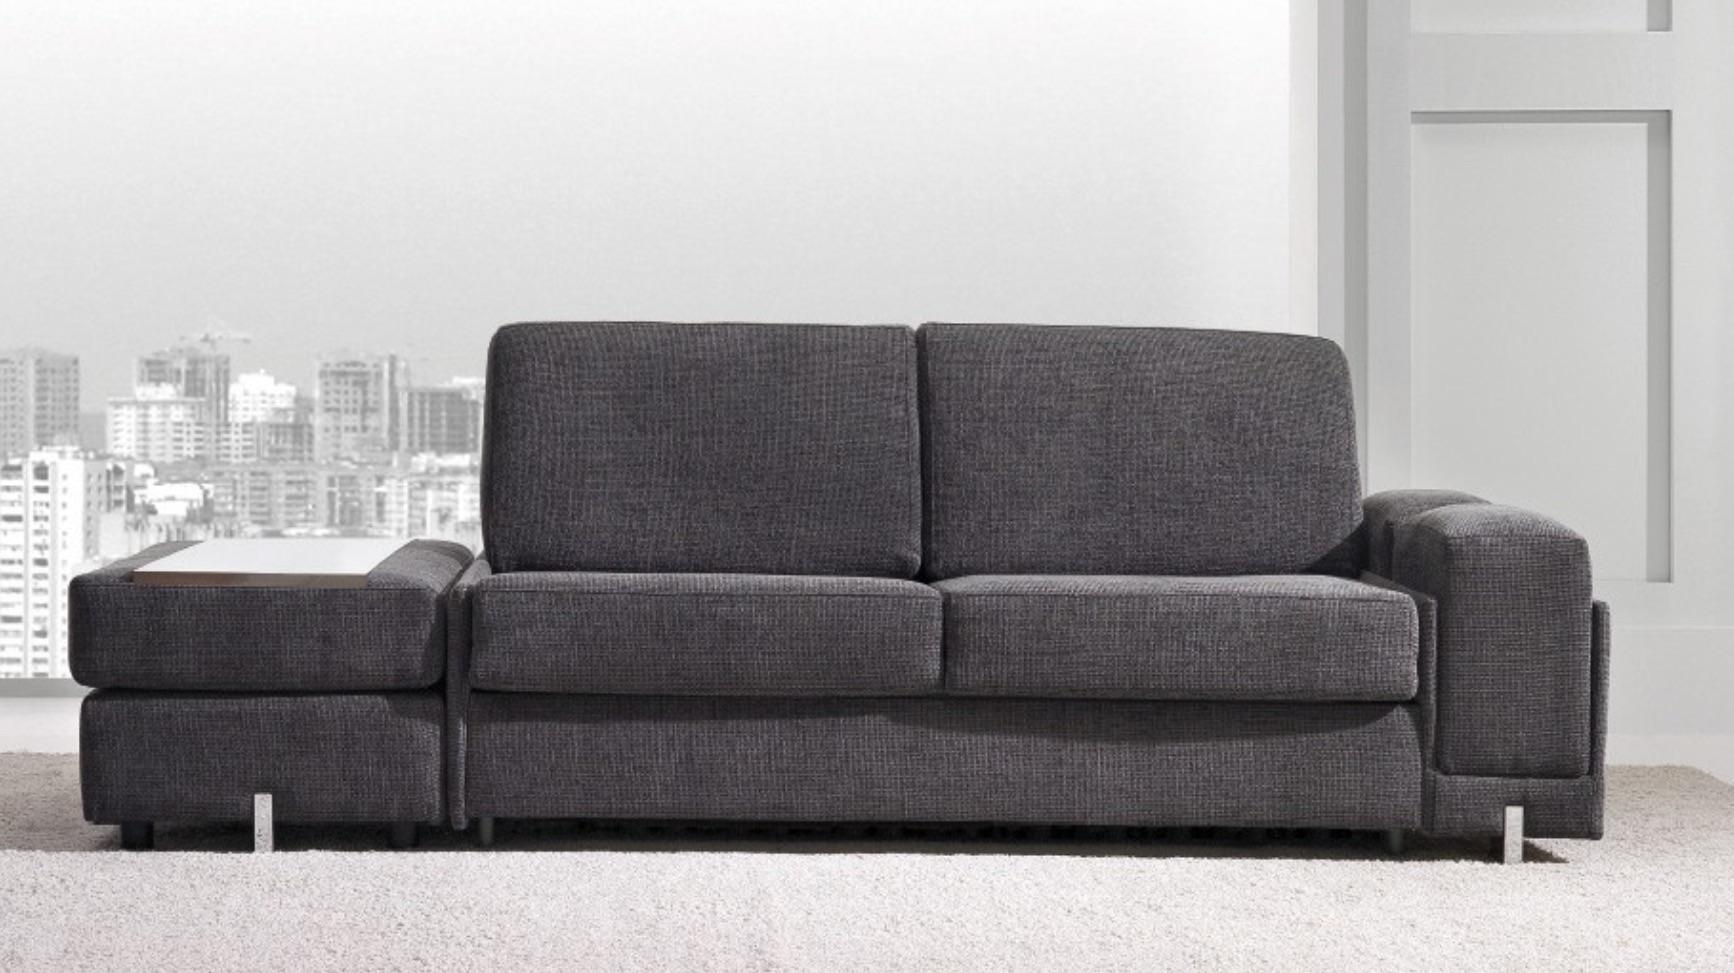 Pin sof cama sistema italiano marseille en oferta segovia for Sofa cama sistema italiano en oferta